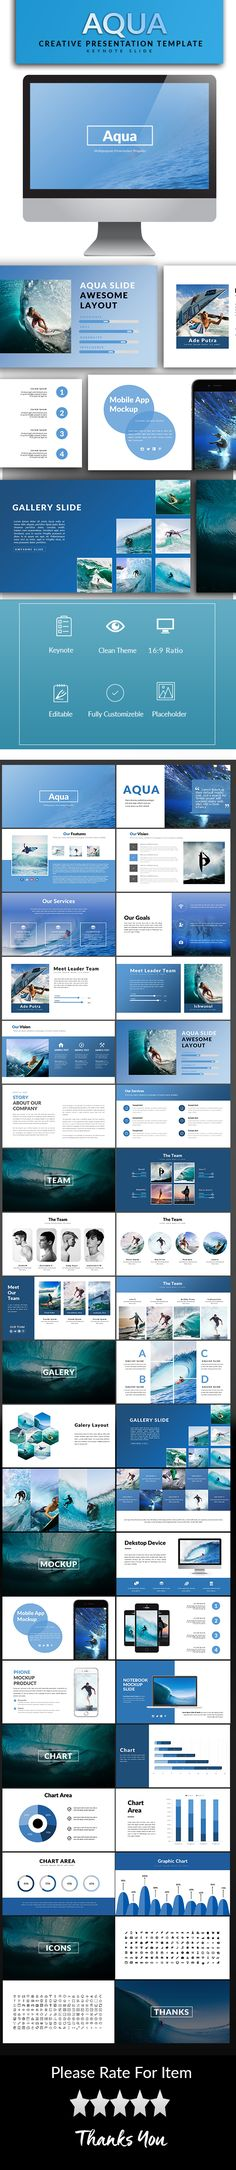 Aqua Keynote Template - Keynote Templates Presentation Templates